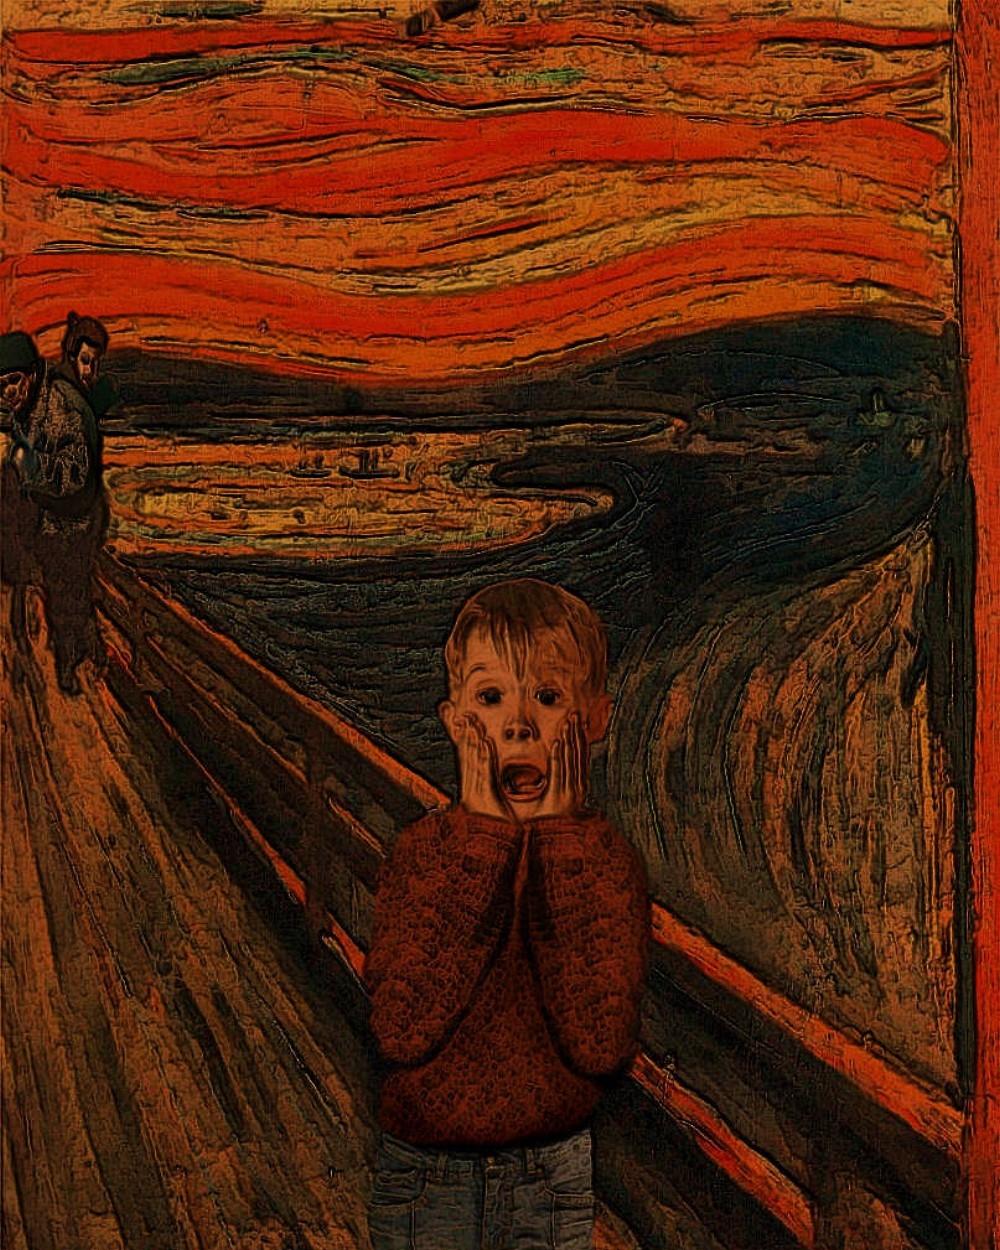 Macaulay-Culkin-in-the-Scream-Painting-79979